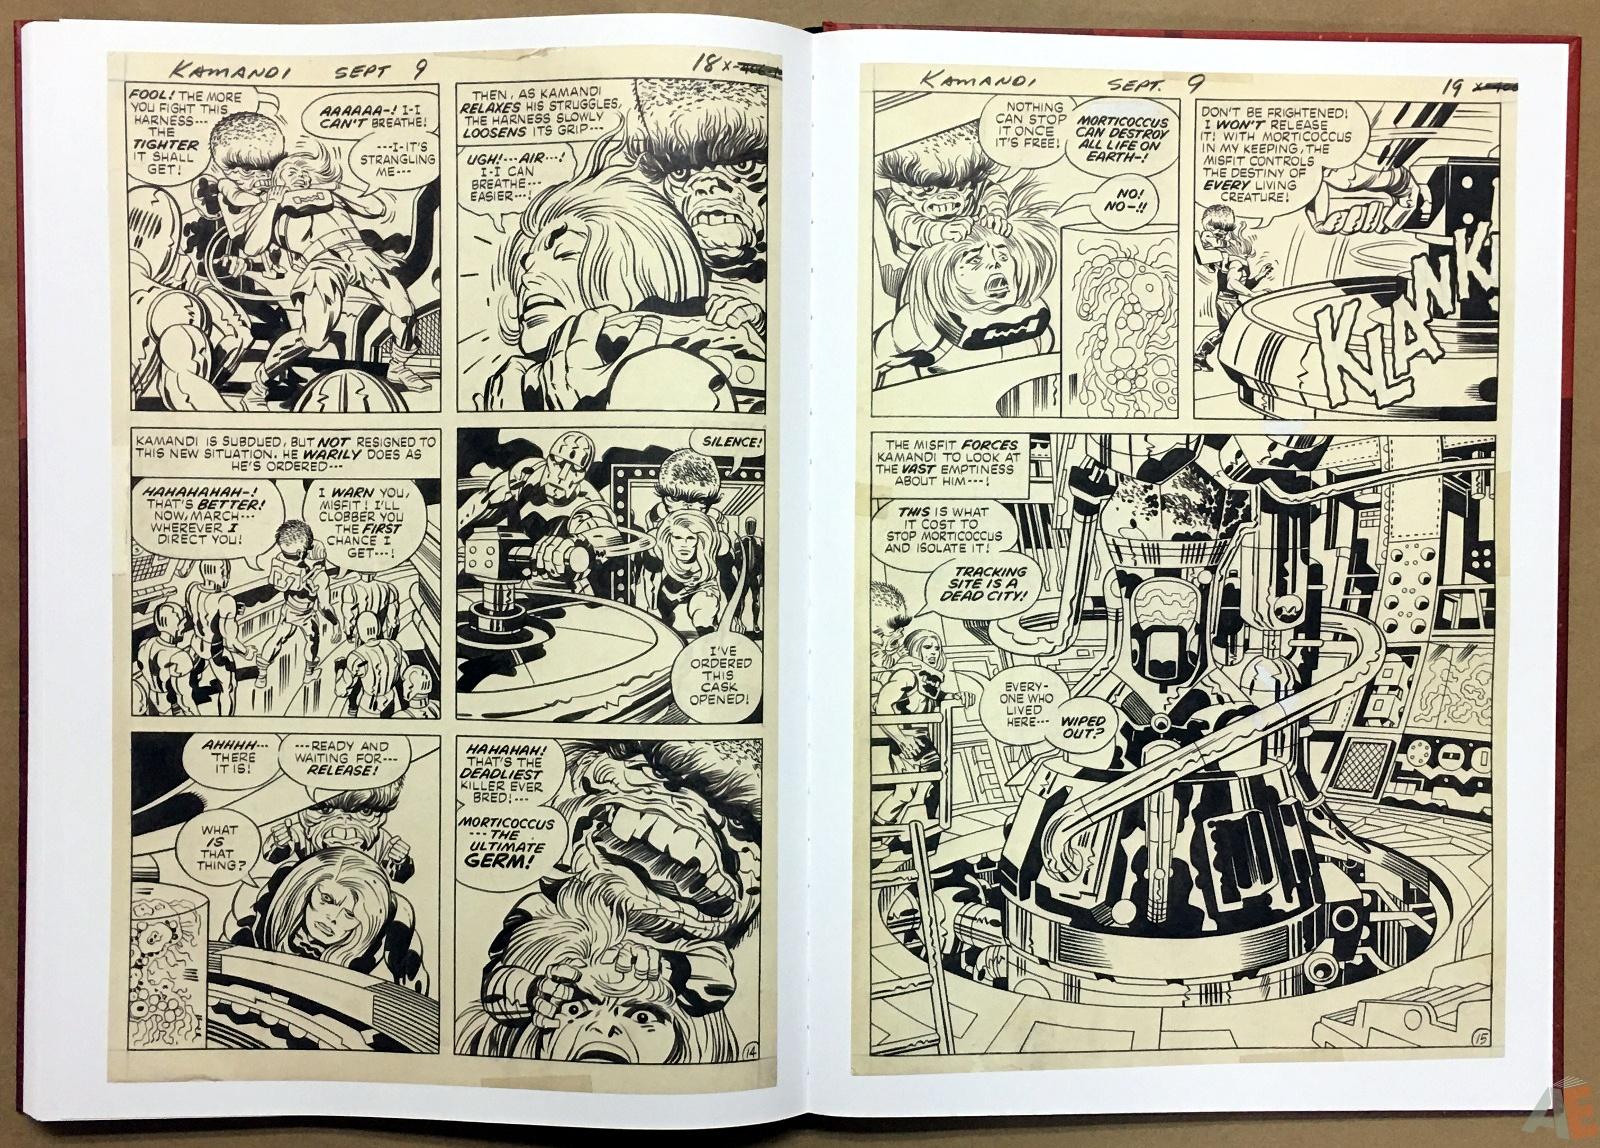 Jack Kirby Kamandi The Last Boy On Earth Artist's Edition 44